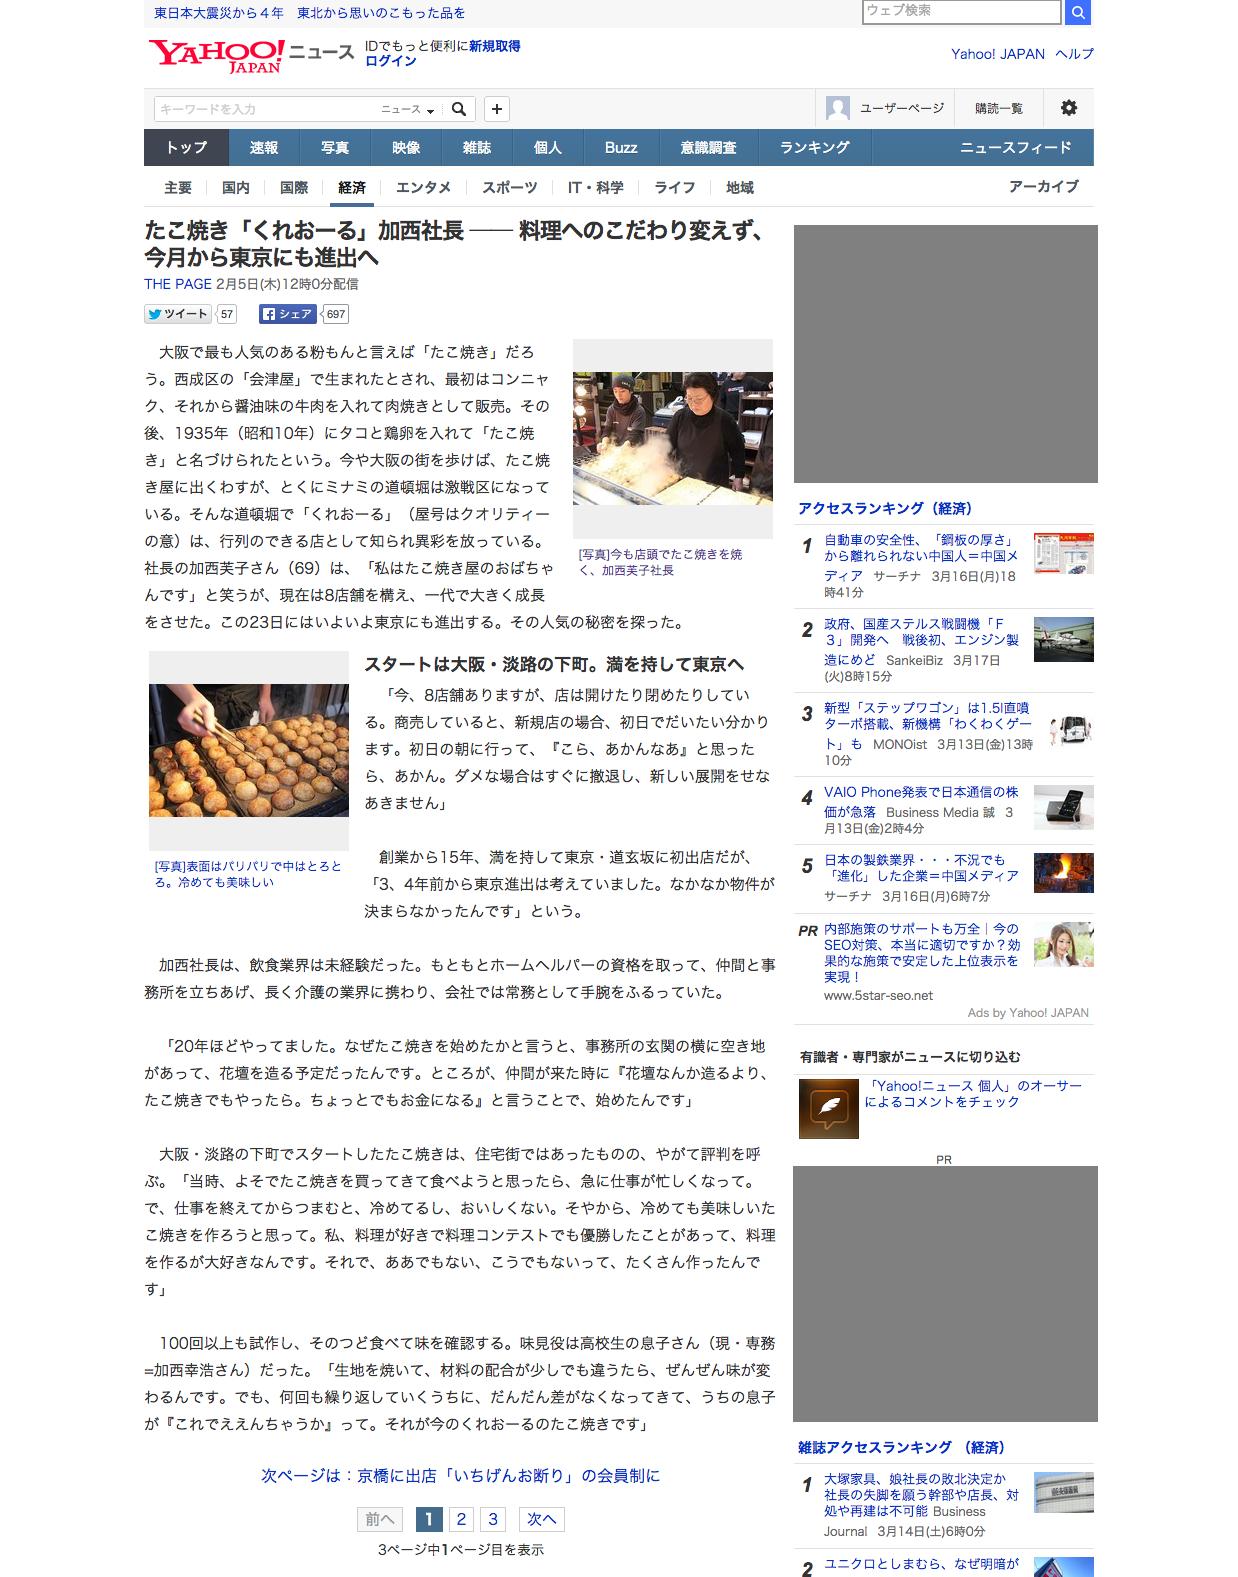 [Yahoo! News posted]